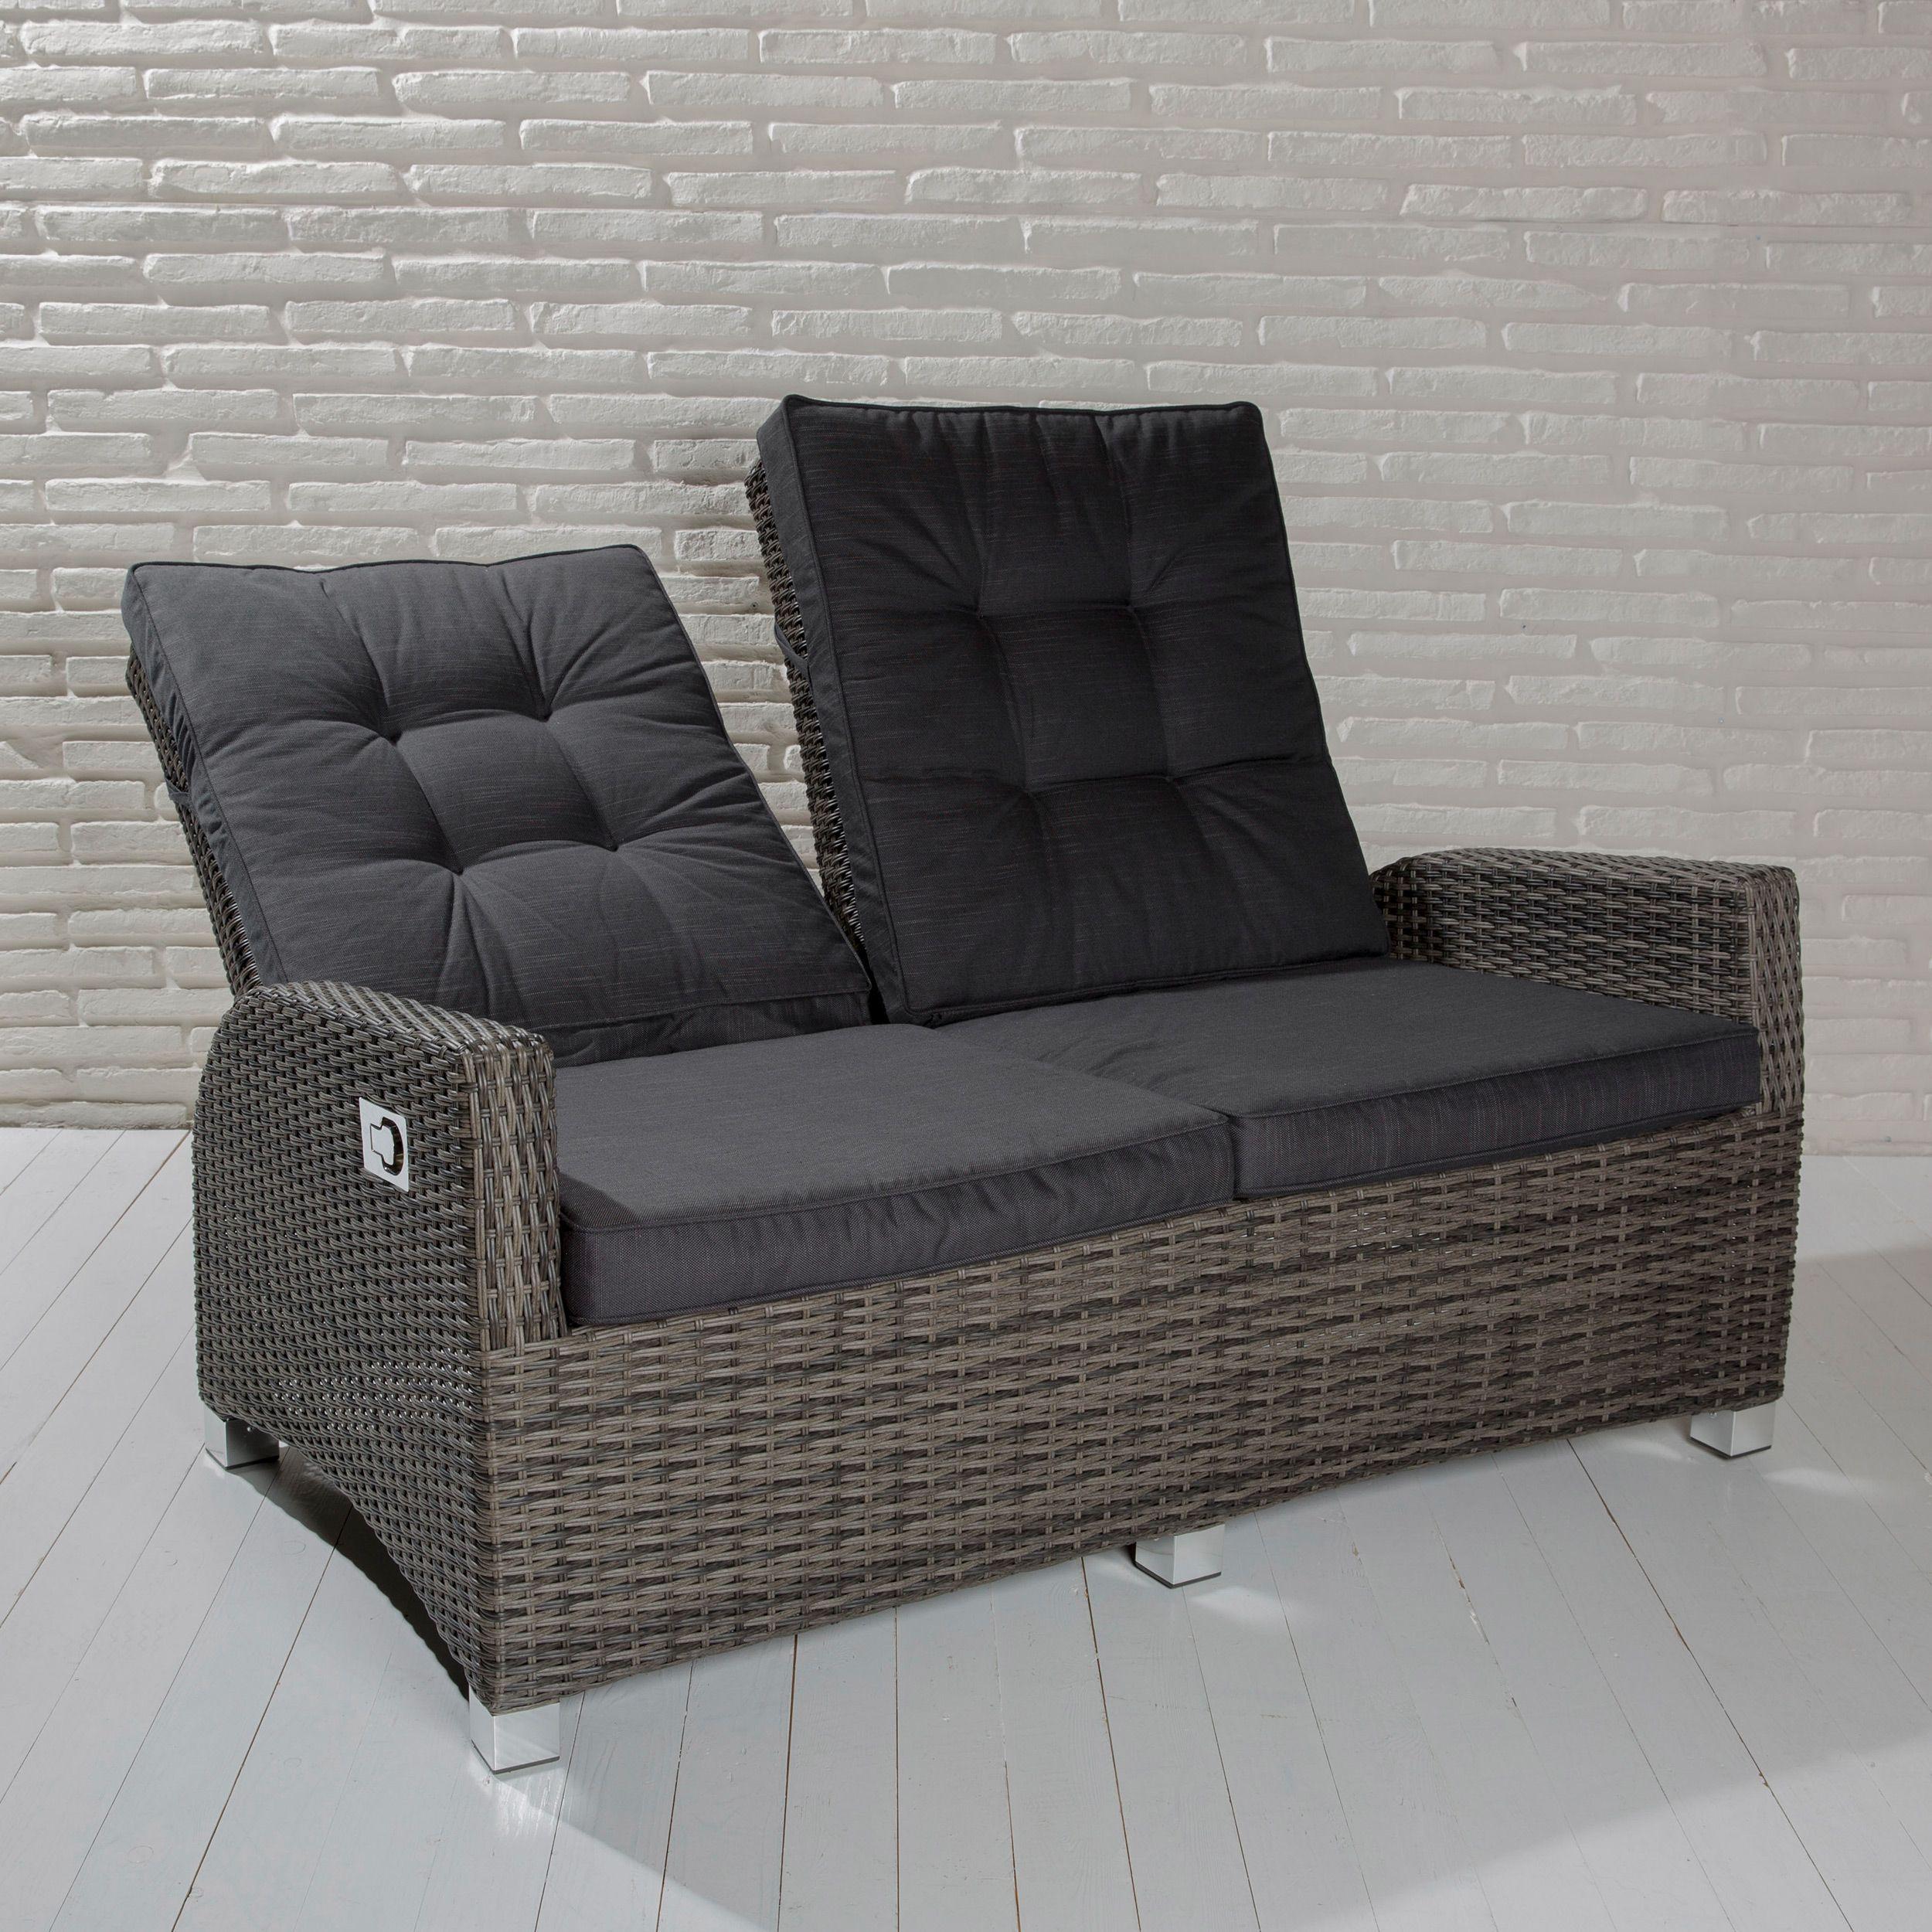 2er Sofa Aus Der Barcelona Living Serie Mit Verstellbarer Ruckenlehne Barcelona Gartenmobel Outdoormobel Gartensofa So 2er Sofa Lounge Garnitur Couch Grau